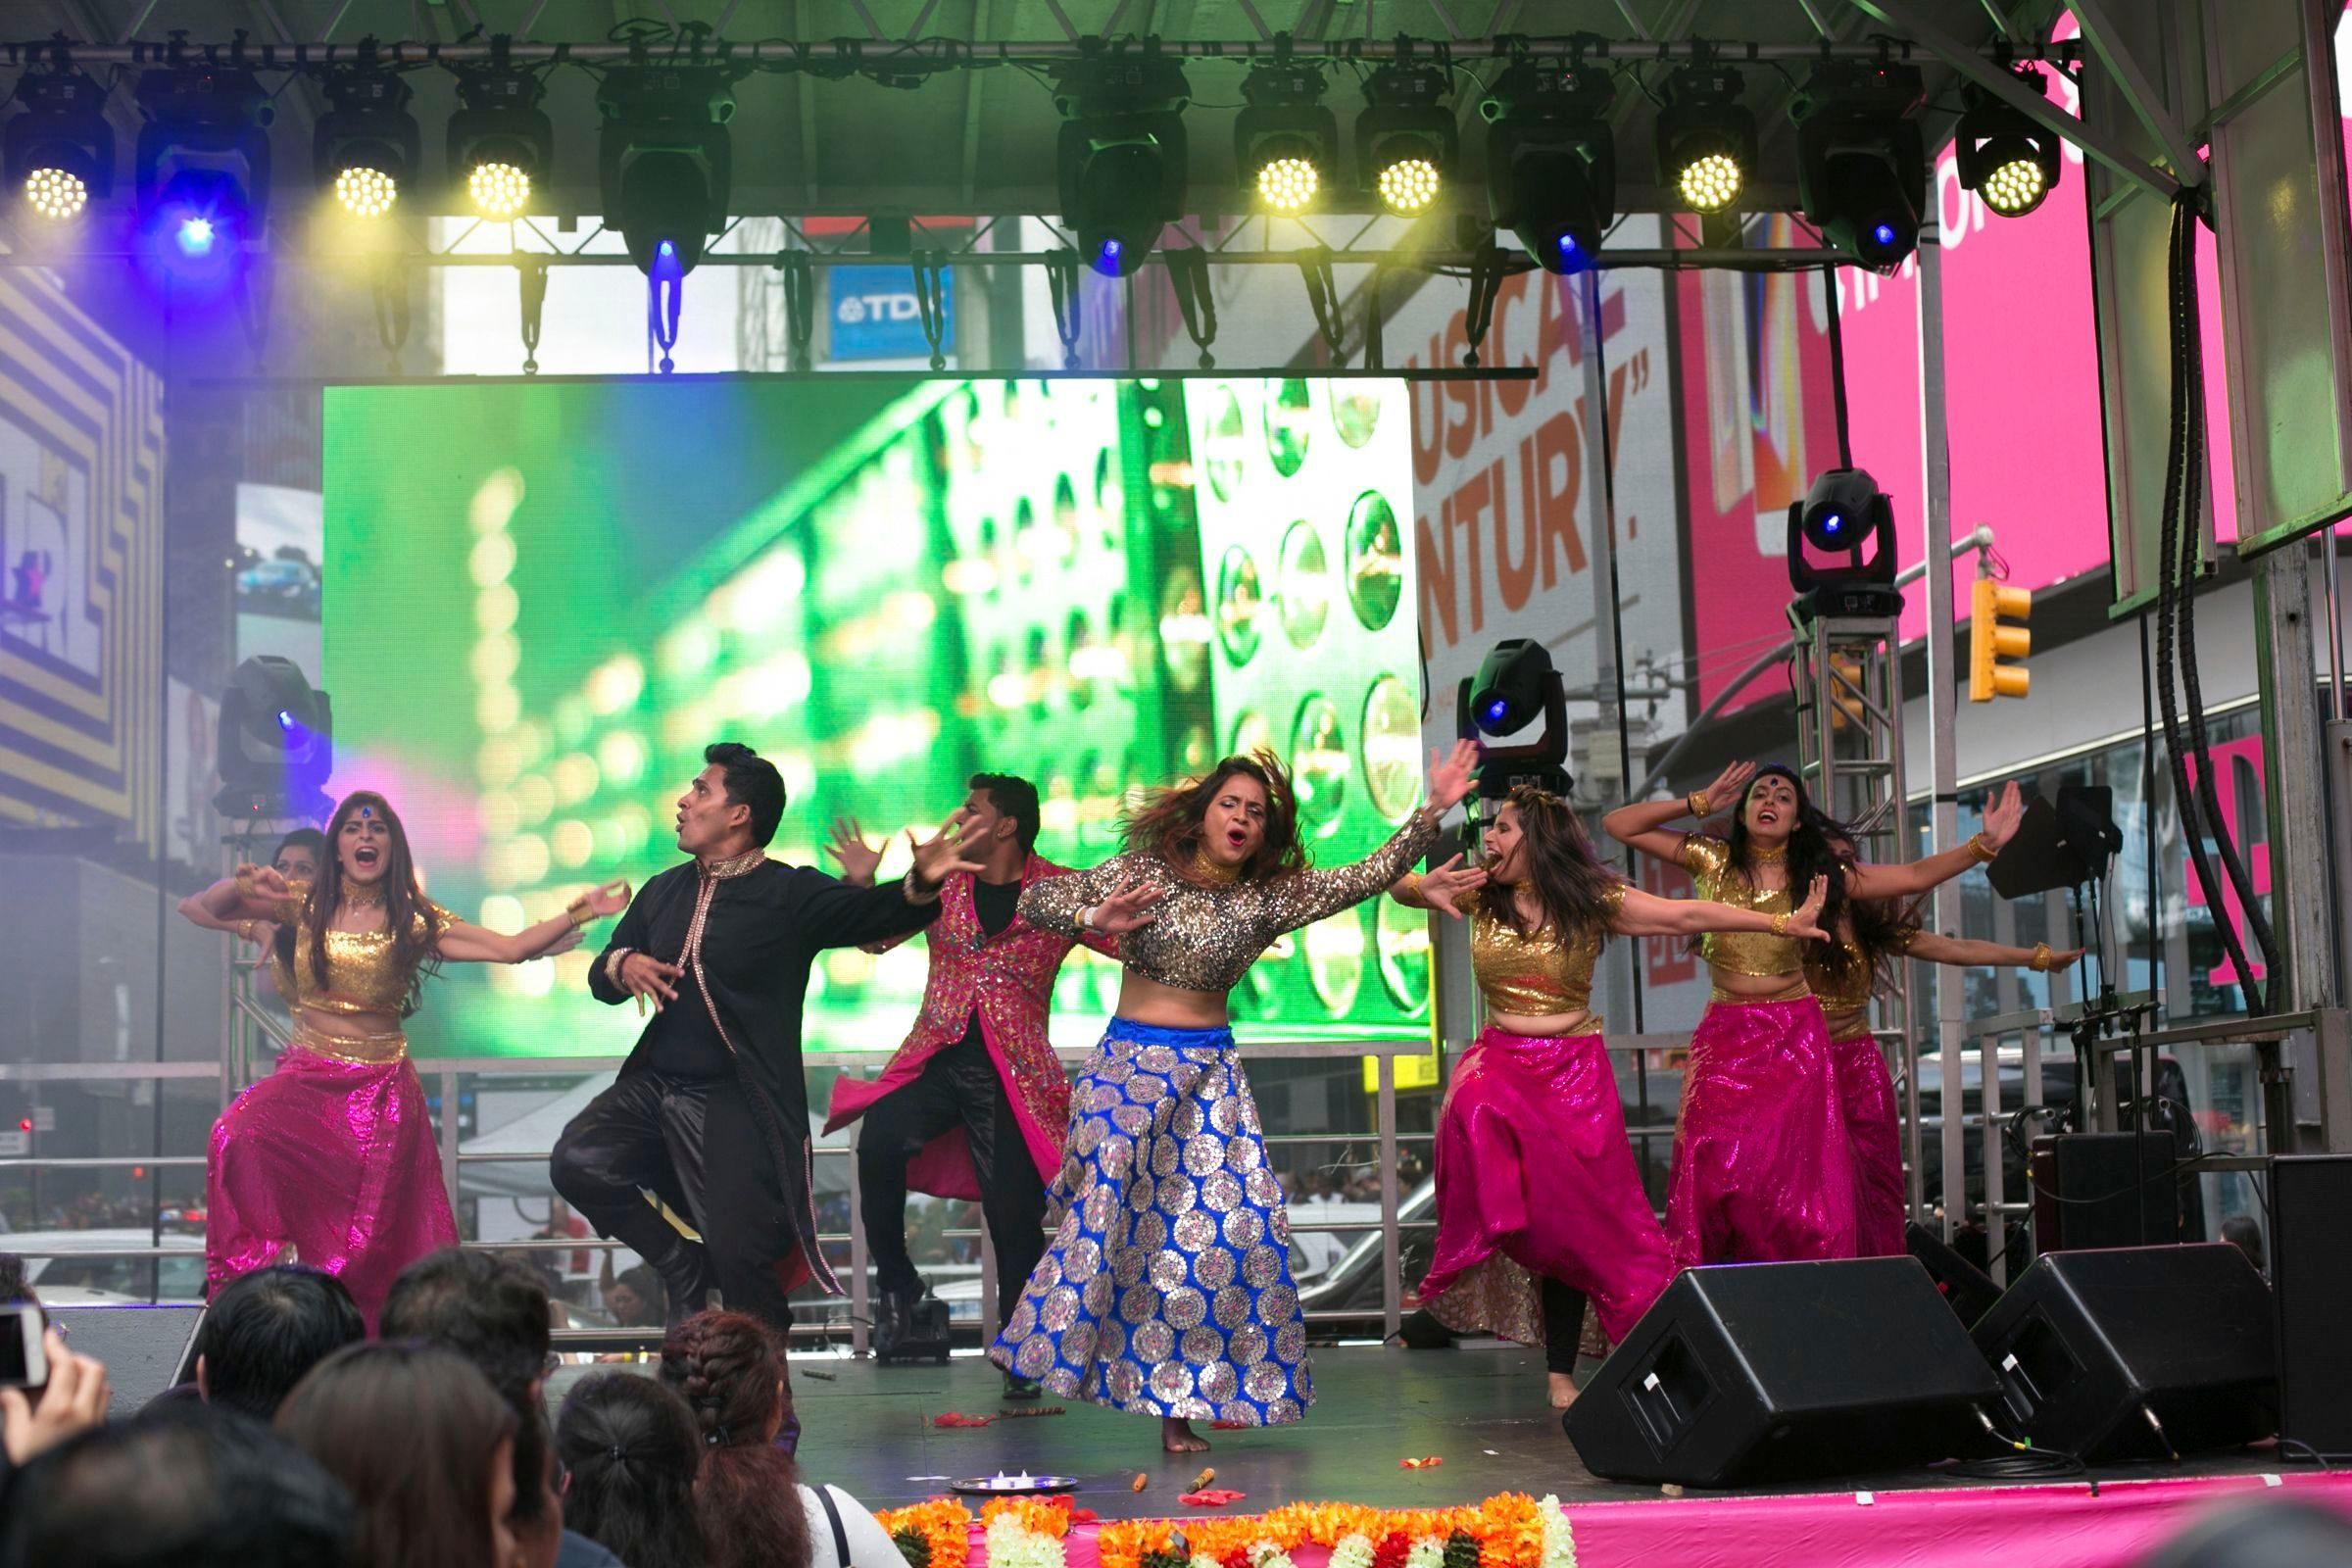 Diwali Festival , New York, USA - 07 Oct 2017